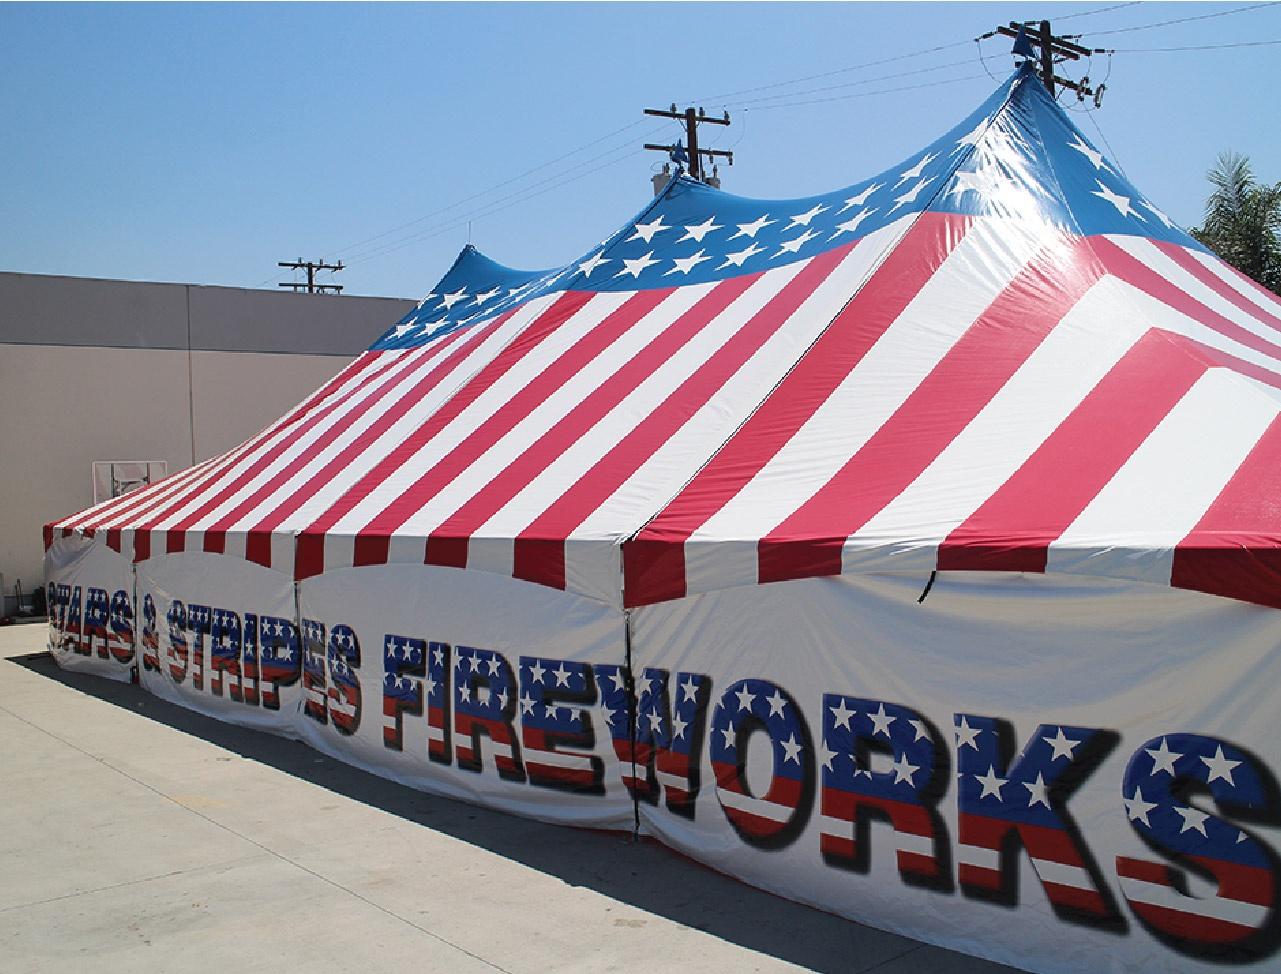 Stars and Stripes USA Patriotic High Peak Frame Tent